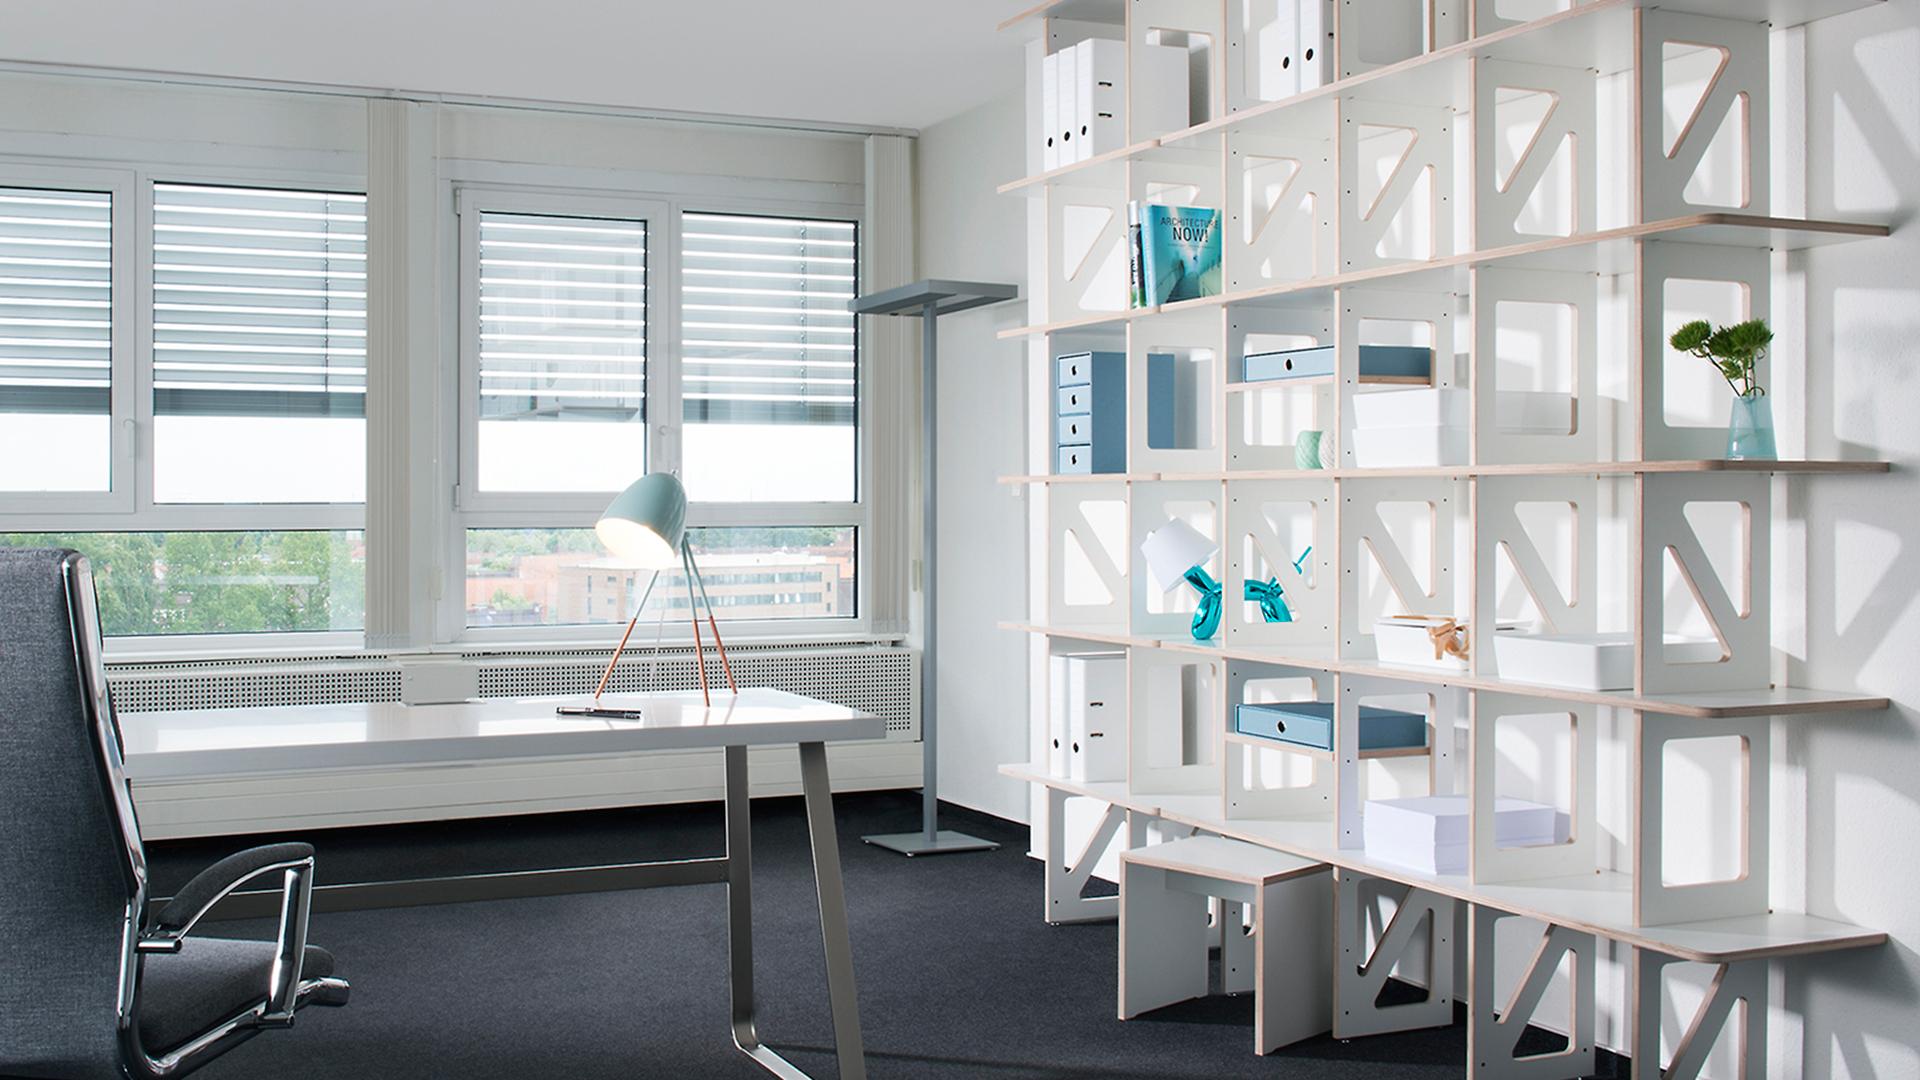 Buero-Regal-Interieur-Anna-M.-Traenkner-Fotografie-Hamburg